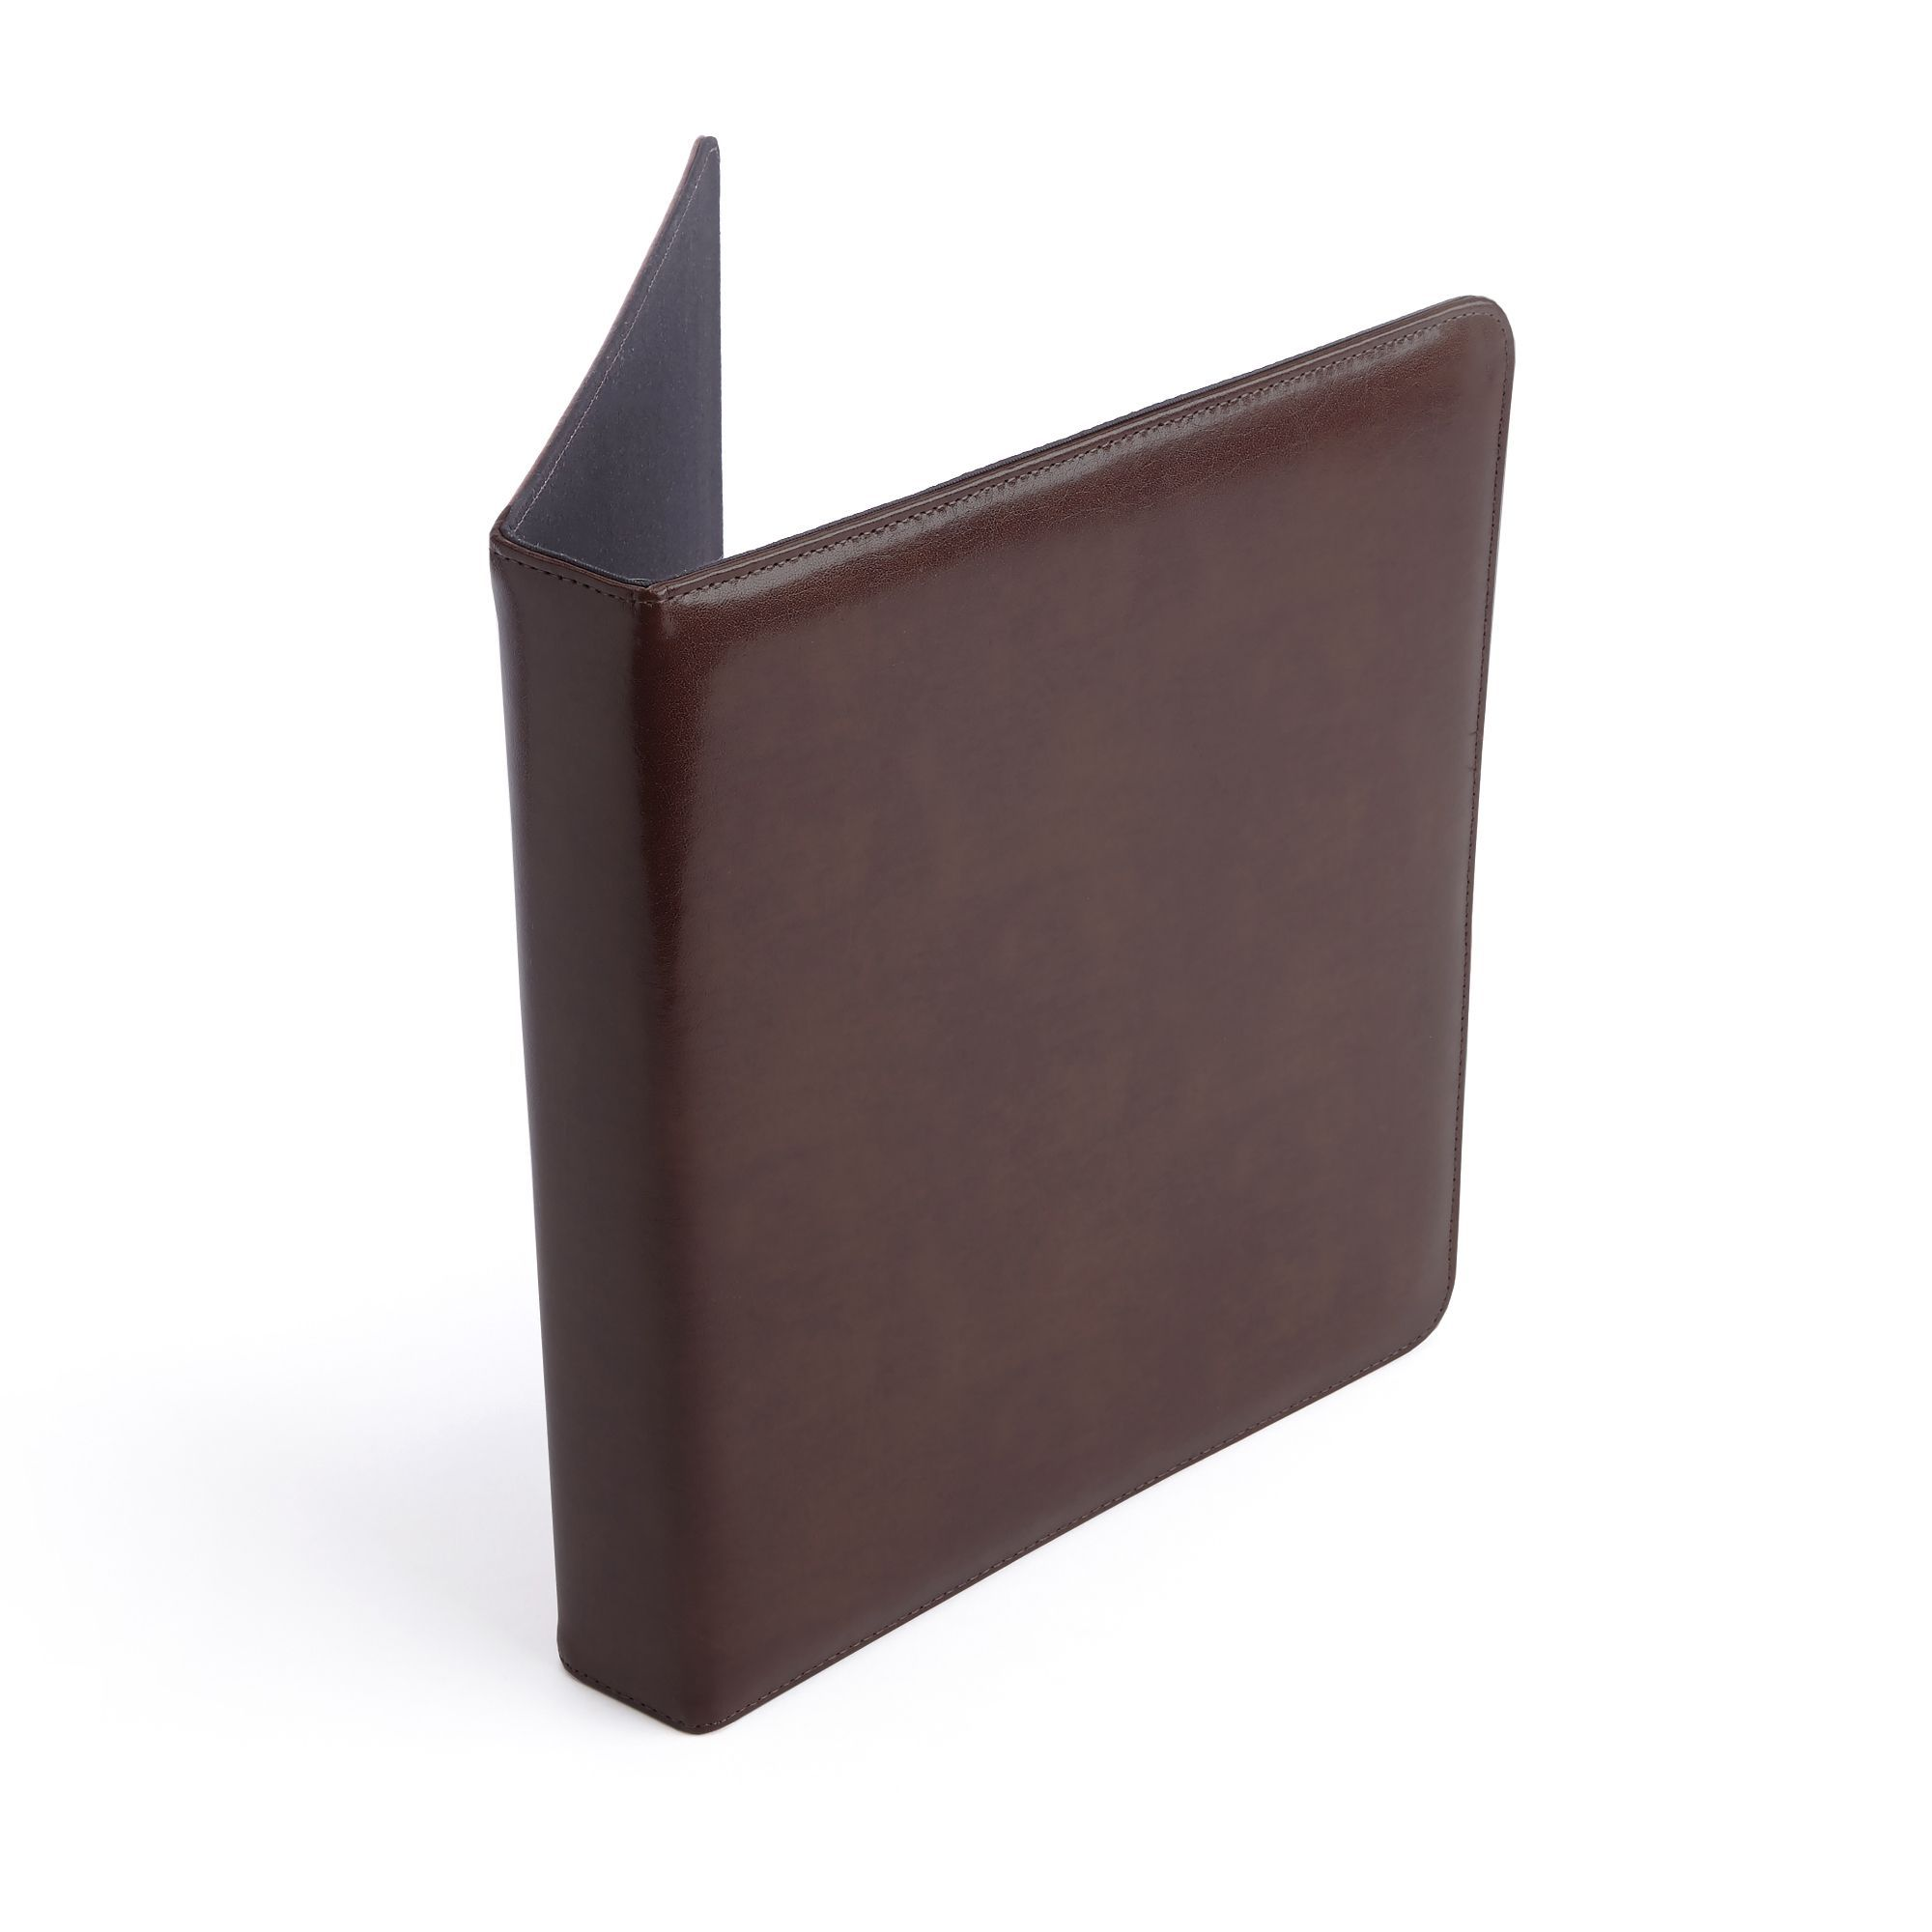 Royce Executive 1-inch Binder/Document Organizer